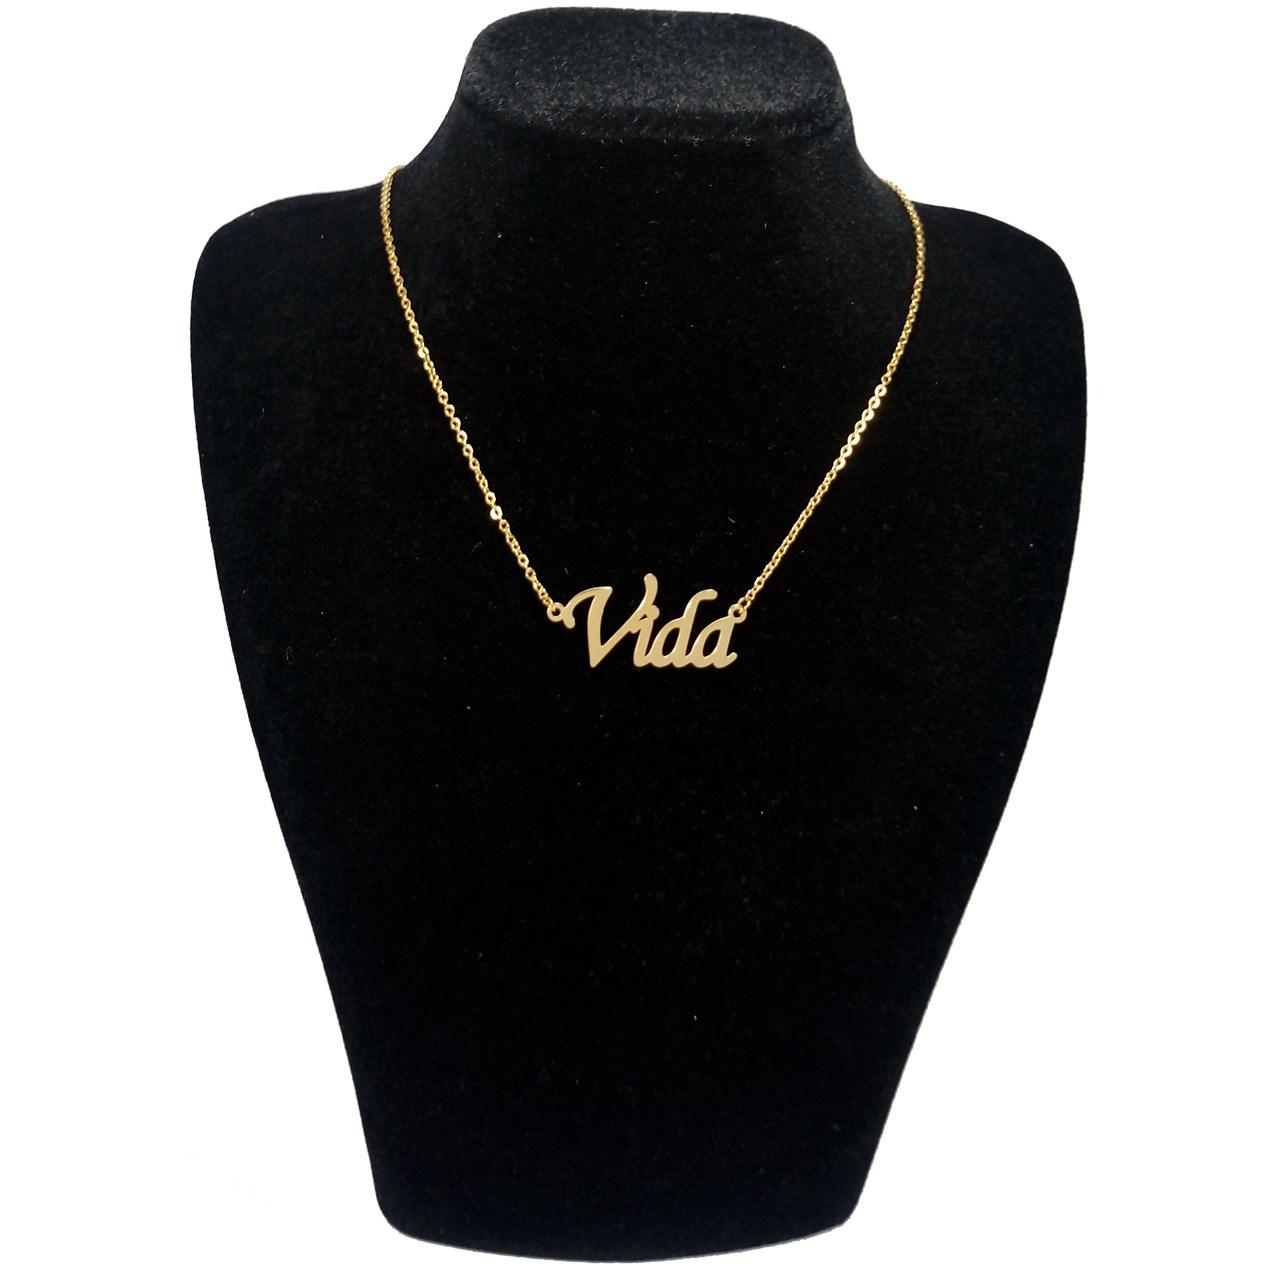 گردنبند آی جواهر طرح نام ویدا کد 1100107GE -  - 1